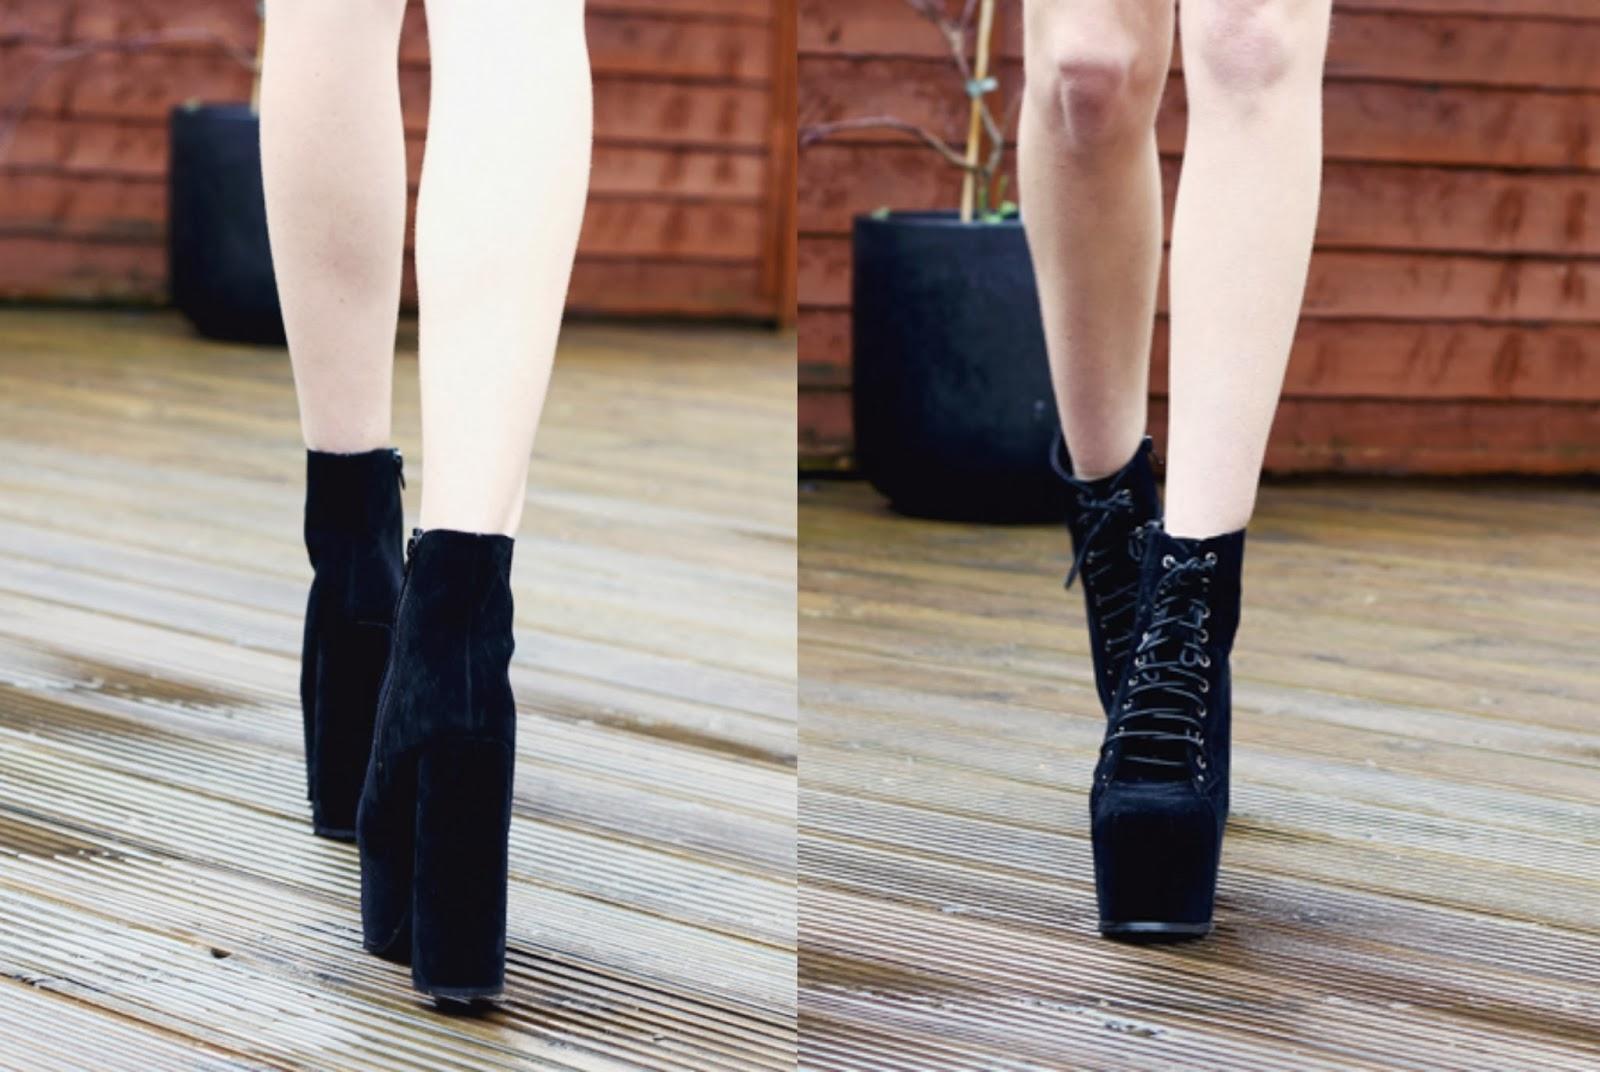 platform boots, Jeffrey Campbell jupes, platform shoes, boots, suede boots, uk blogger, cambridge blogger, uk style blogger, best bloggers, top fashion blogs, top fashion bloggers, affordable fashion blogs, bargain, cheap boots, cheap jeffrey campbells,